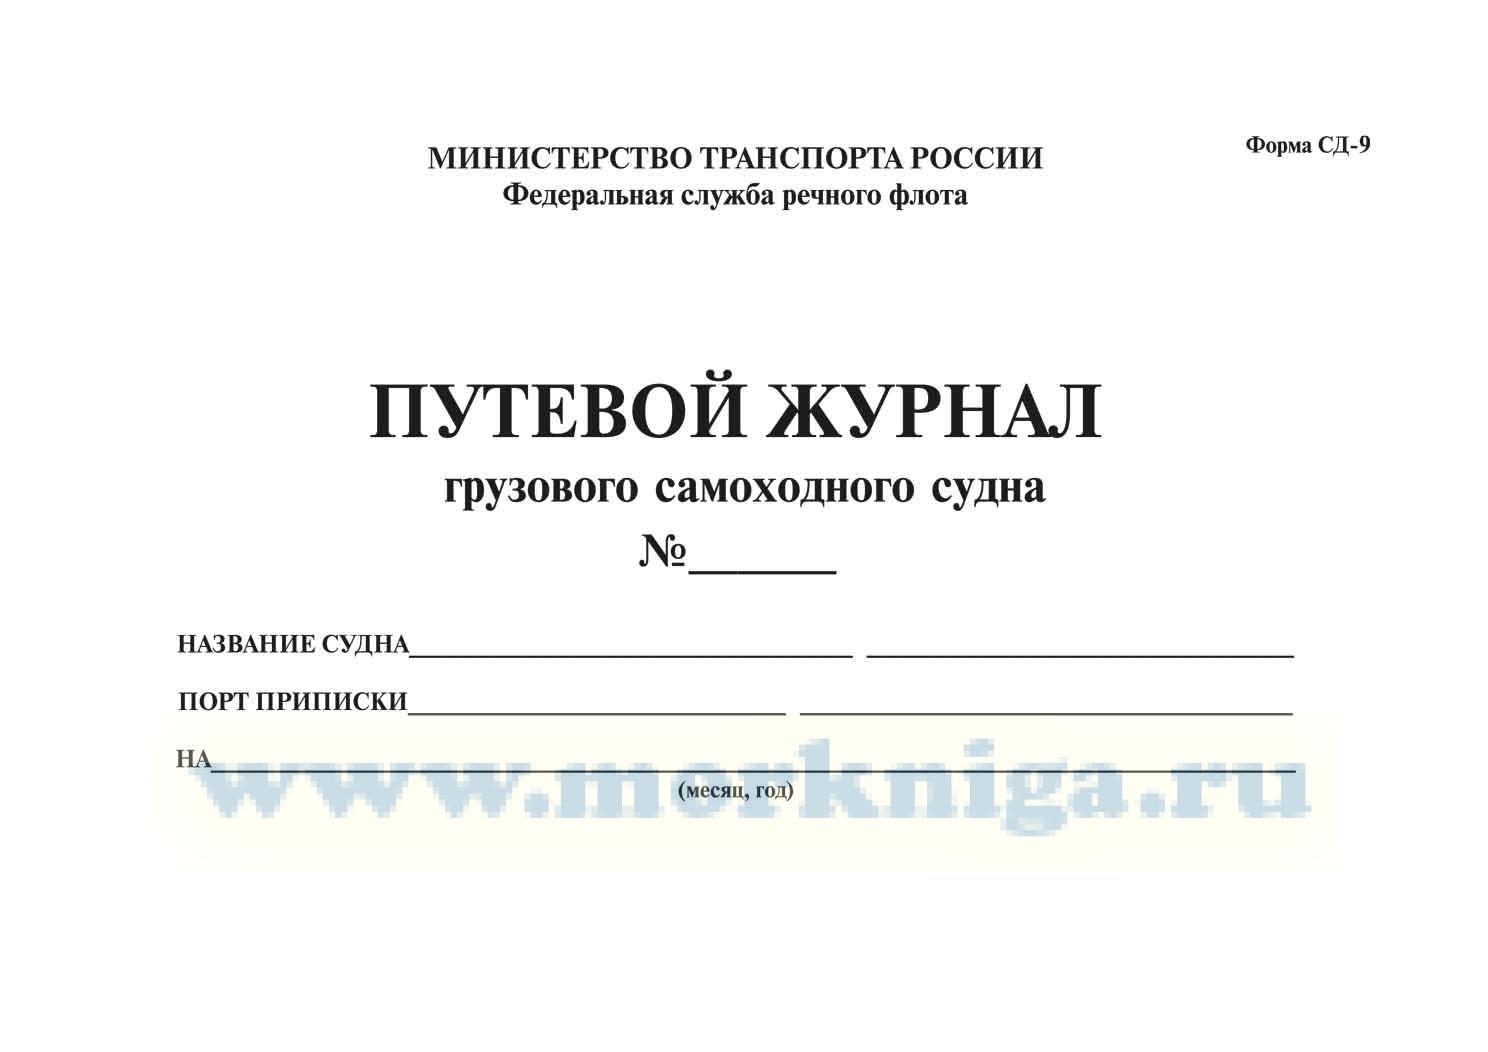 Путевой журнал грузового самоходного судна СД-09